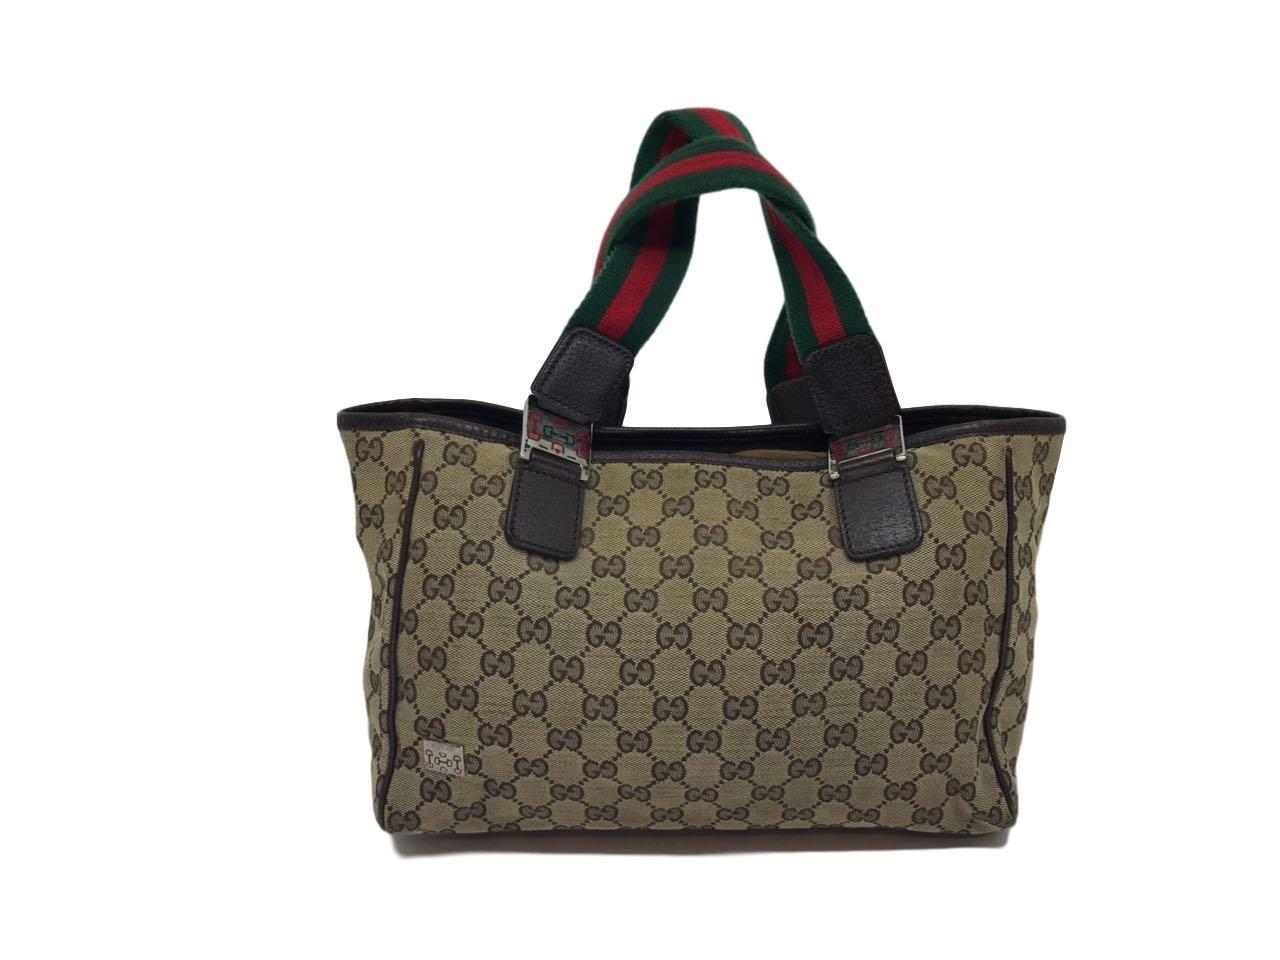 595a1ab0f Bolsa Gucci Monograma listras - Paula Frank | Bolsas de luxo ...